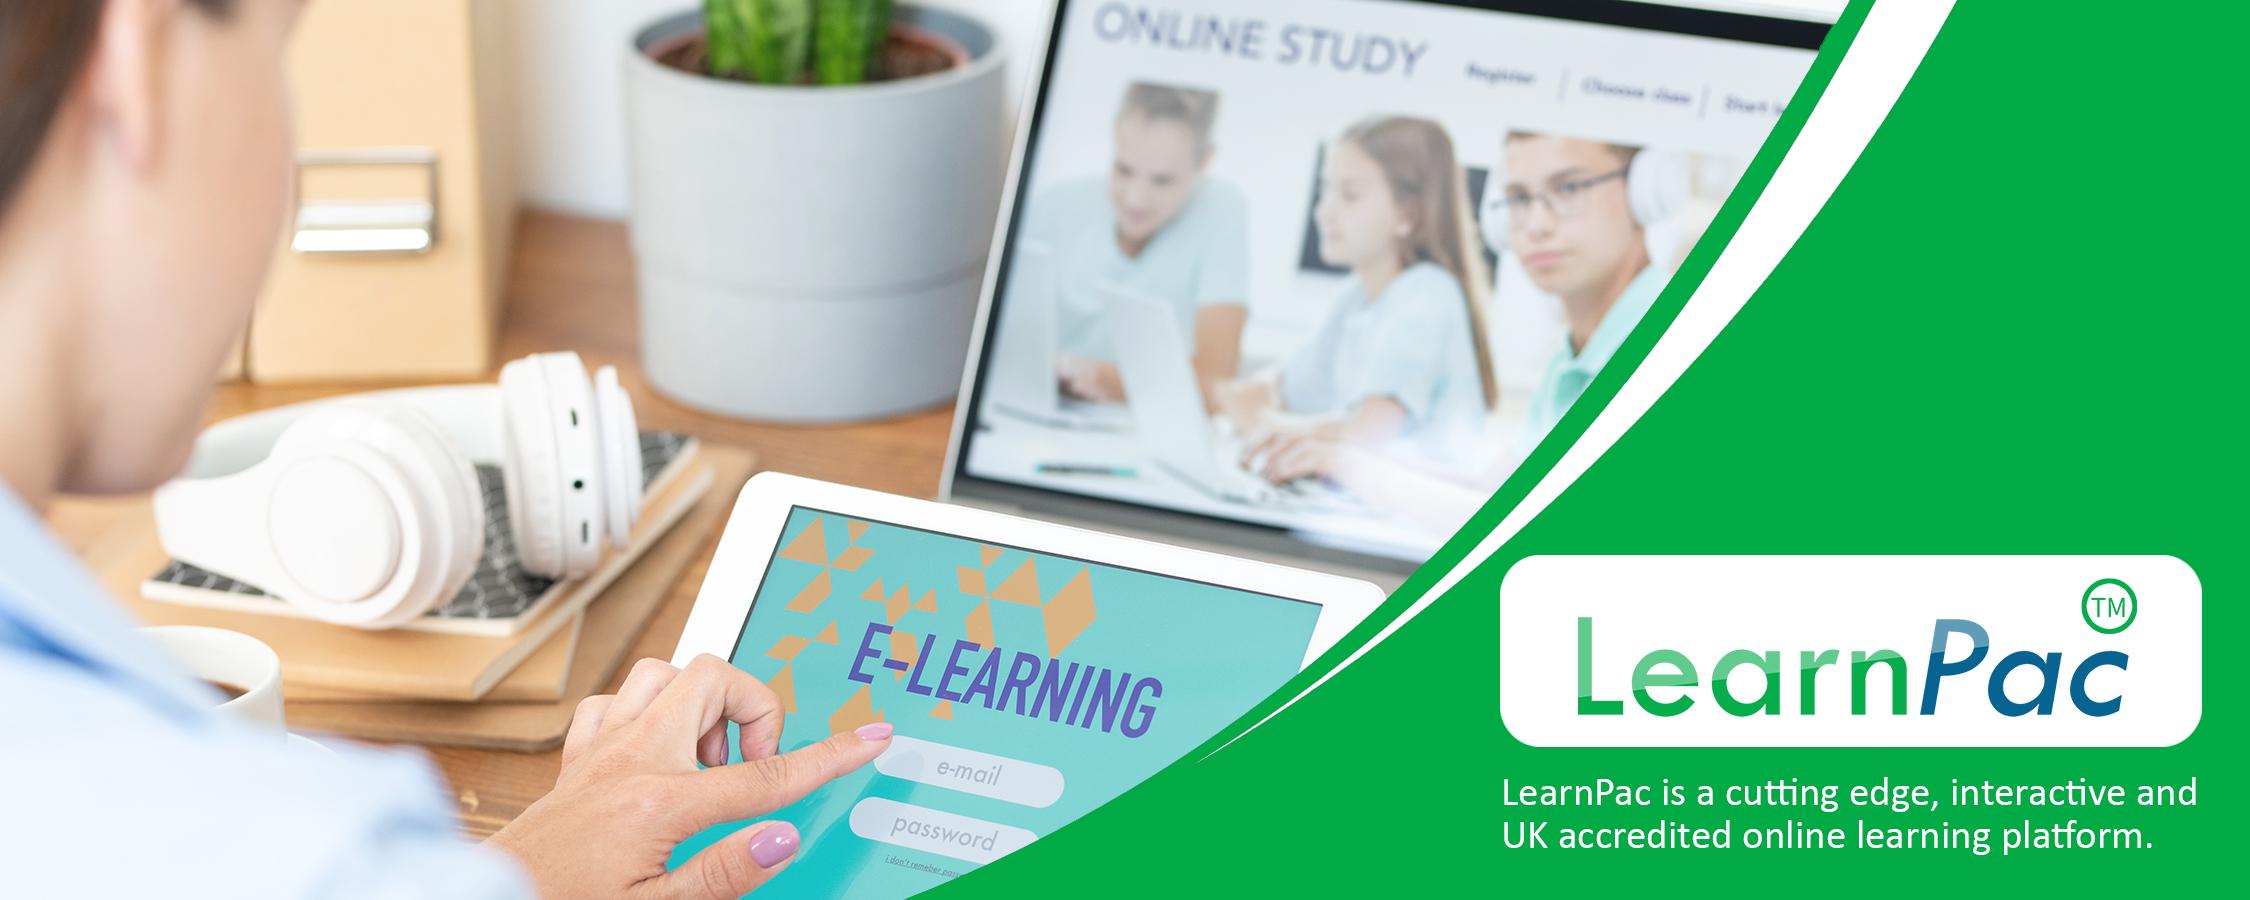 Care Certificate Standard 14 - Online Learning Courses - E-Learning Courses - LearnPac Systems UK -